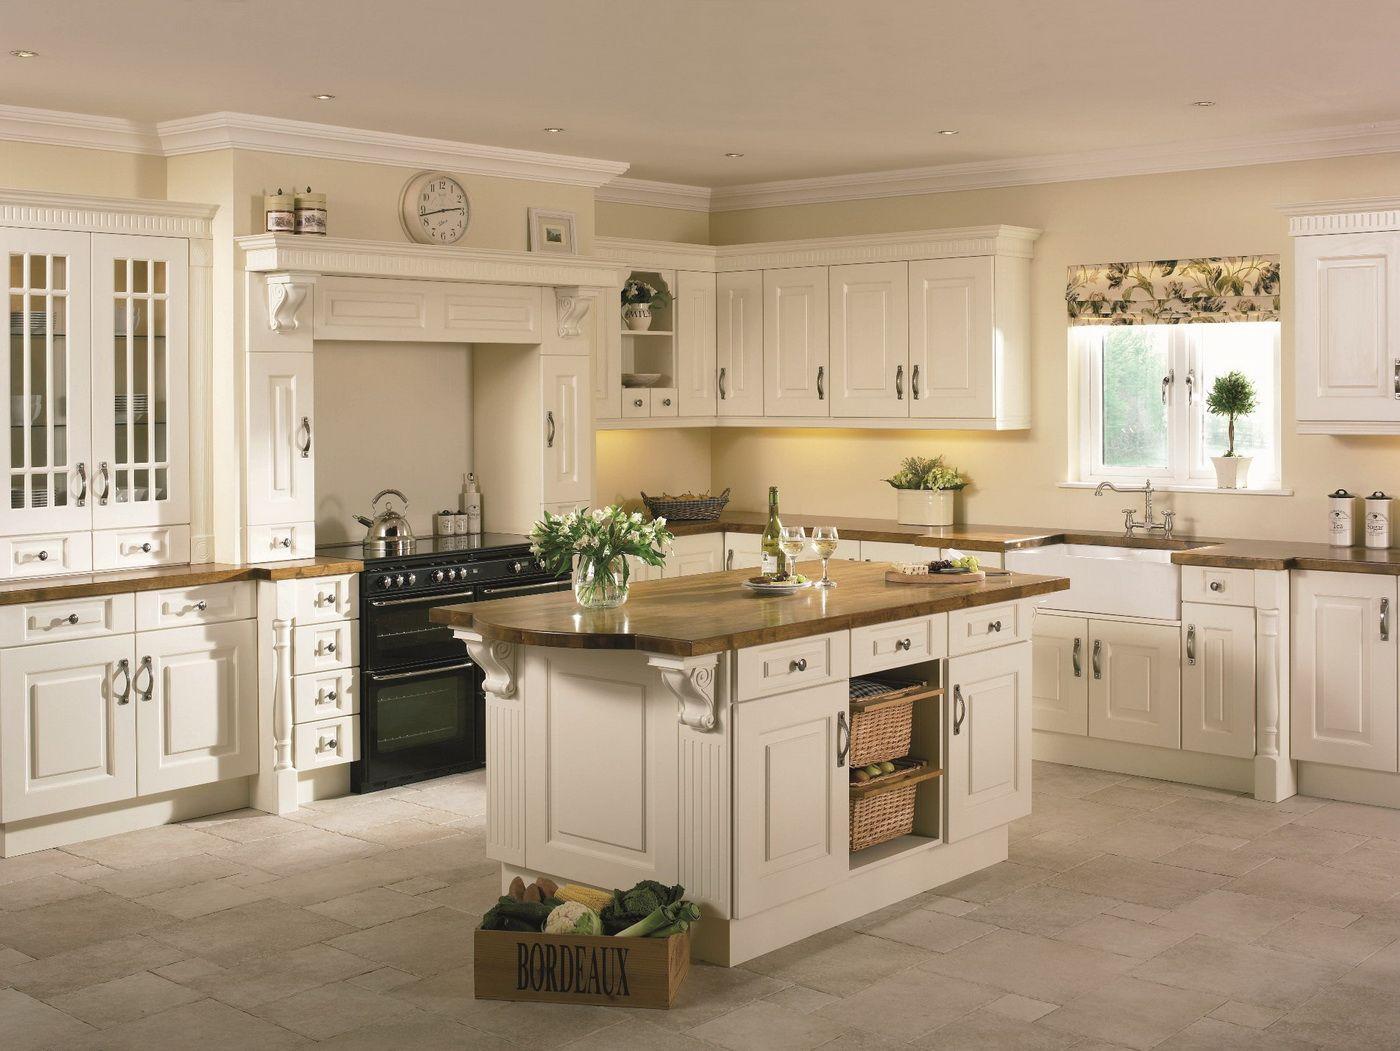 Buy prague plain cream kitchen online uk best value kitchens uk